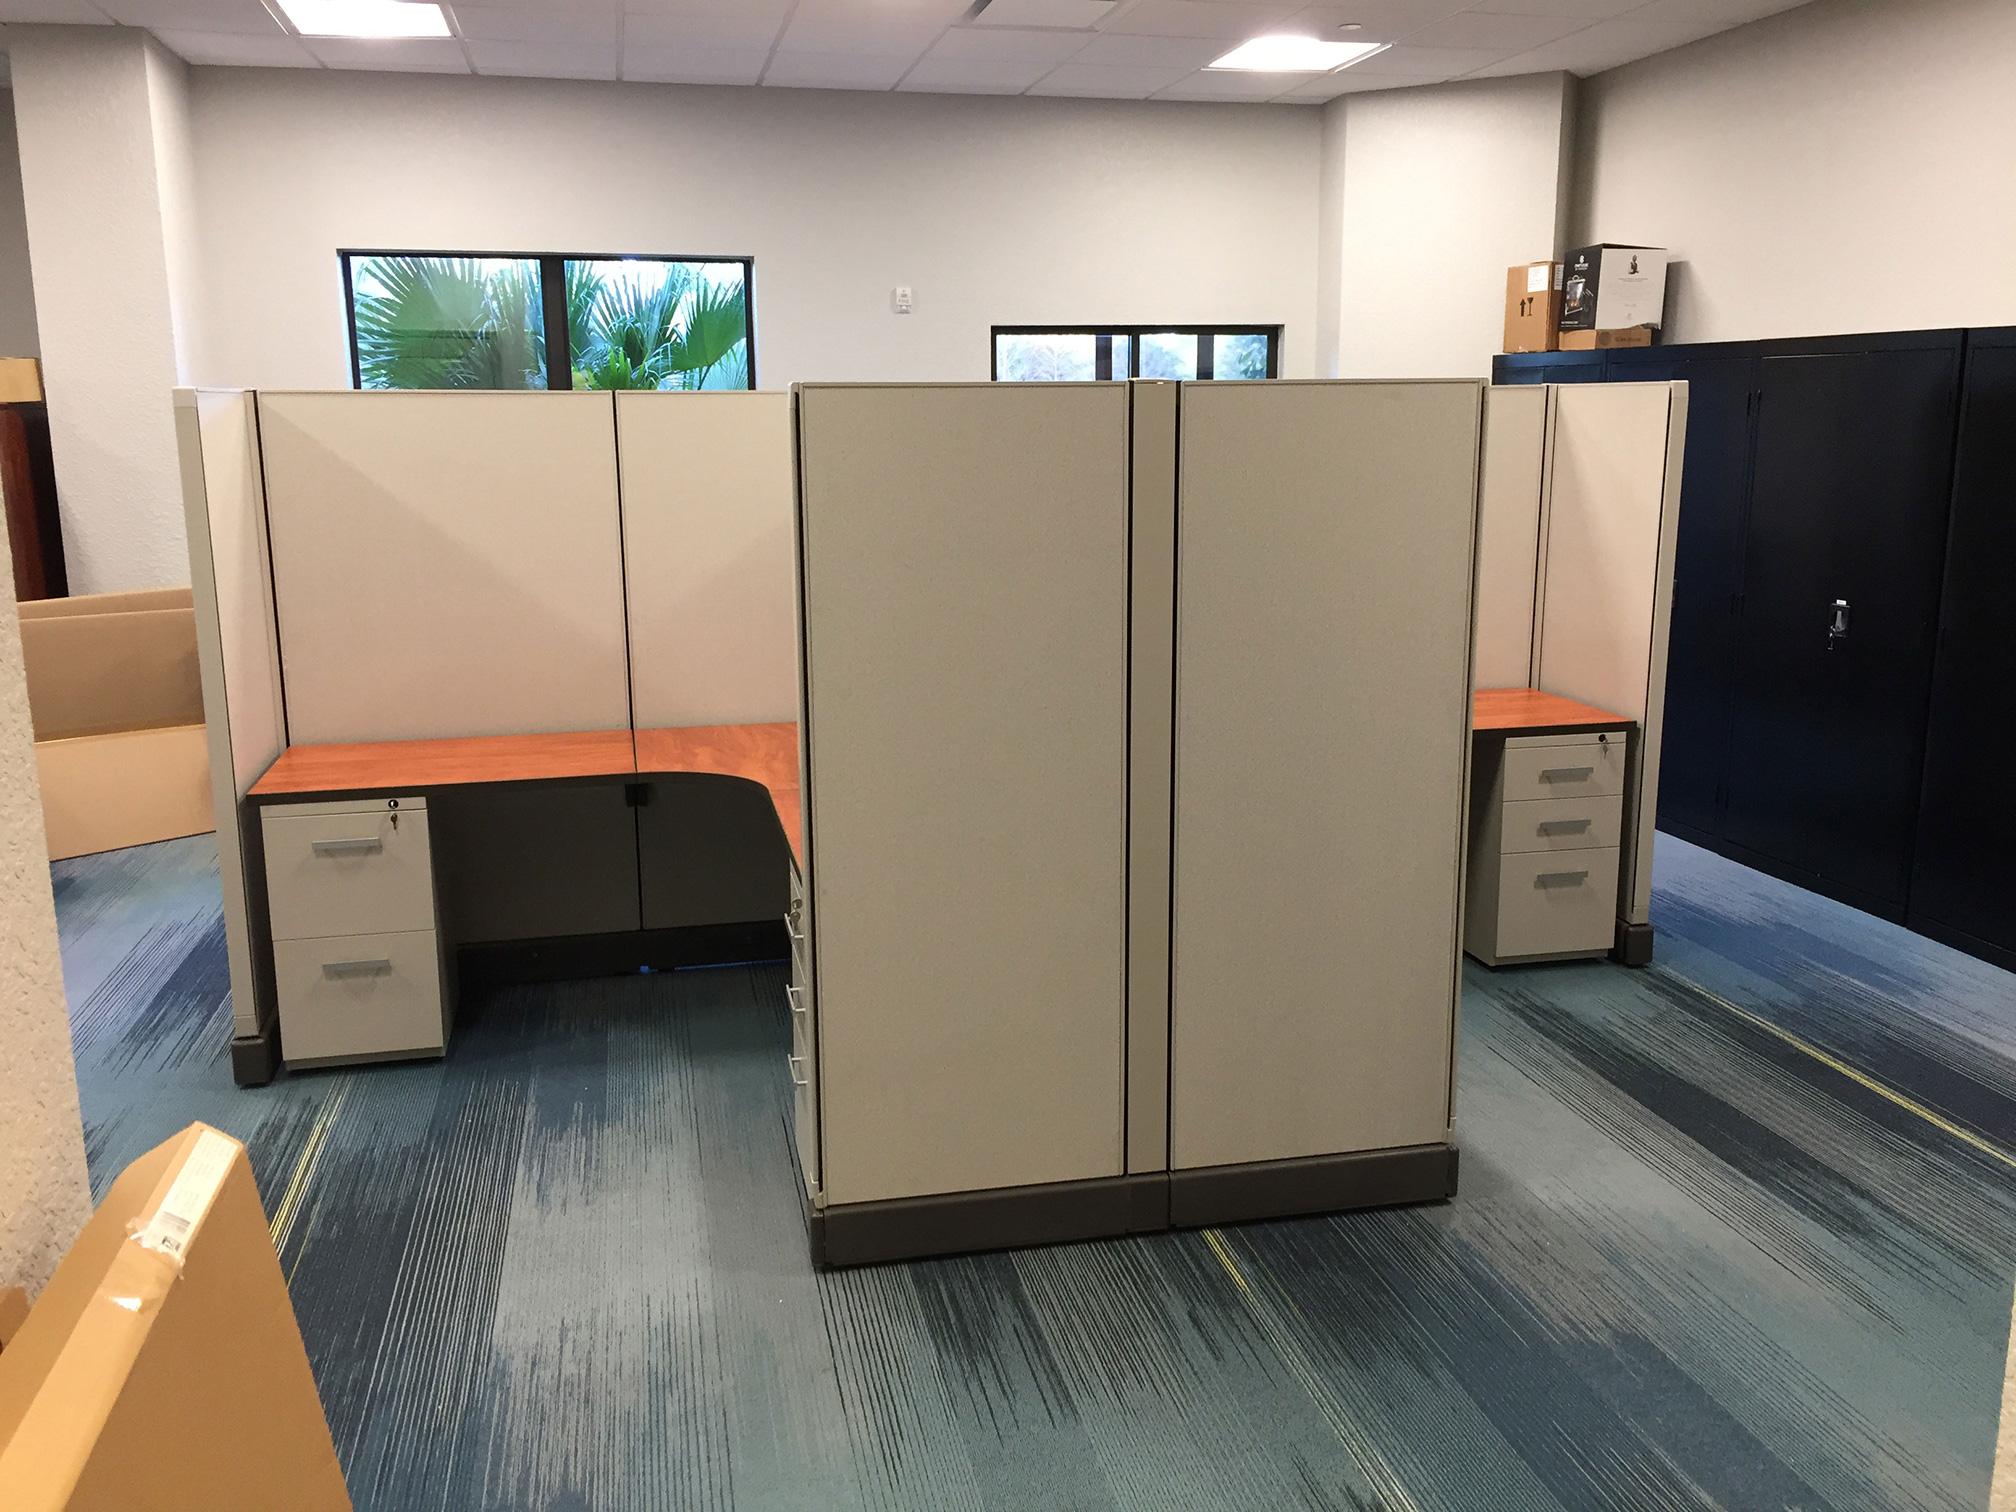 office-cubicles-for-sale-in-sanibel-florida-2.jpg